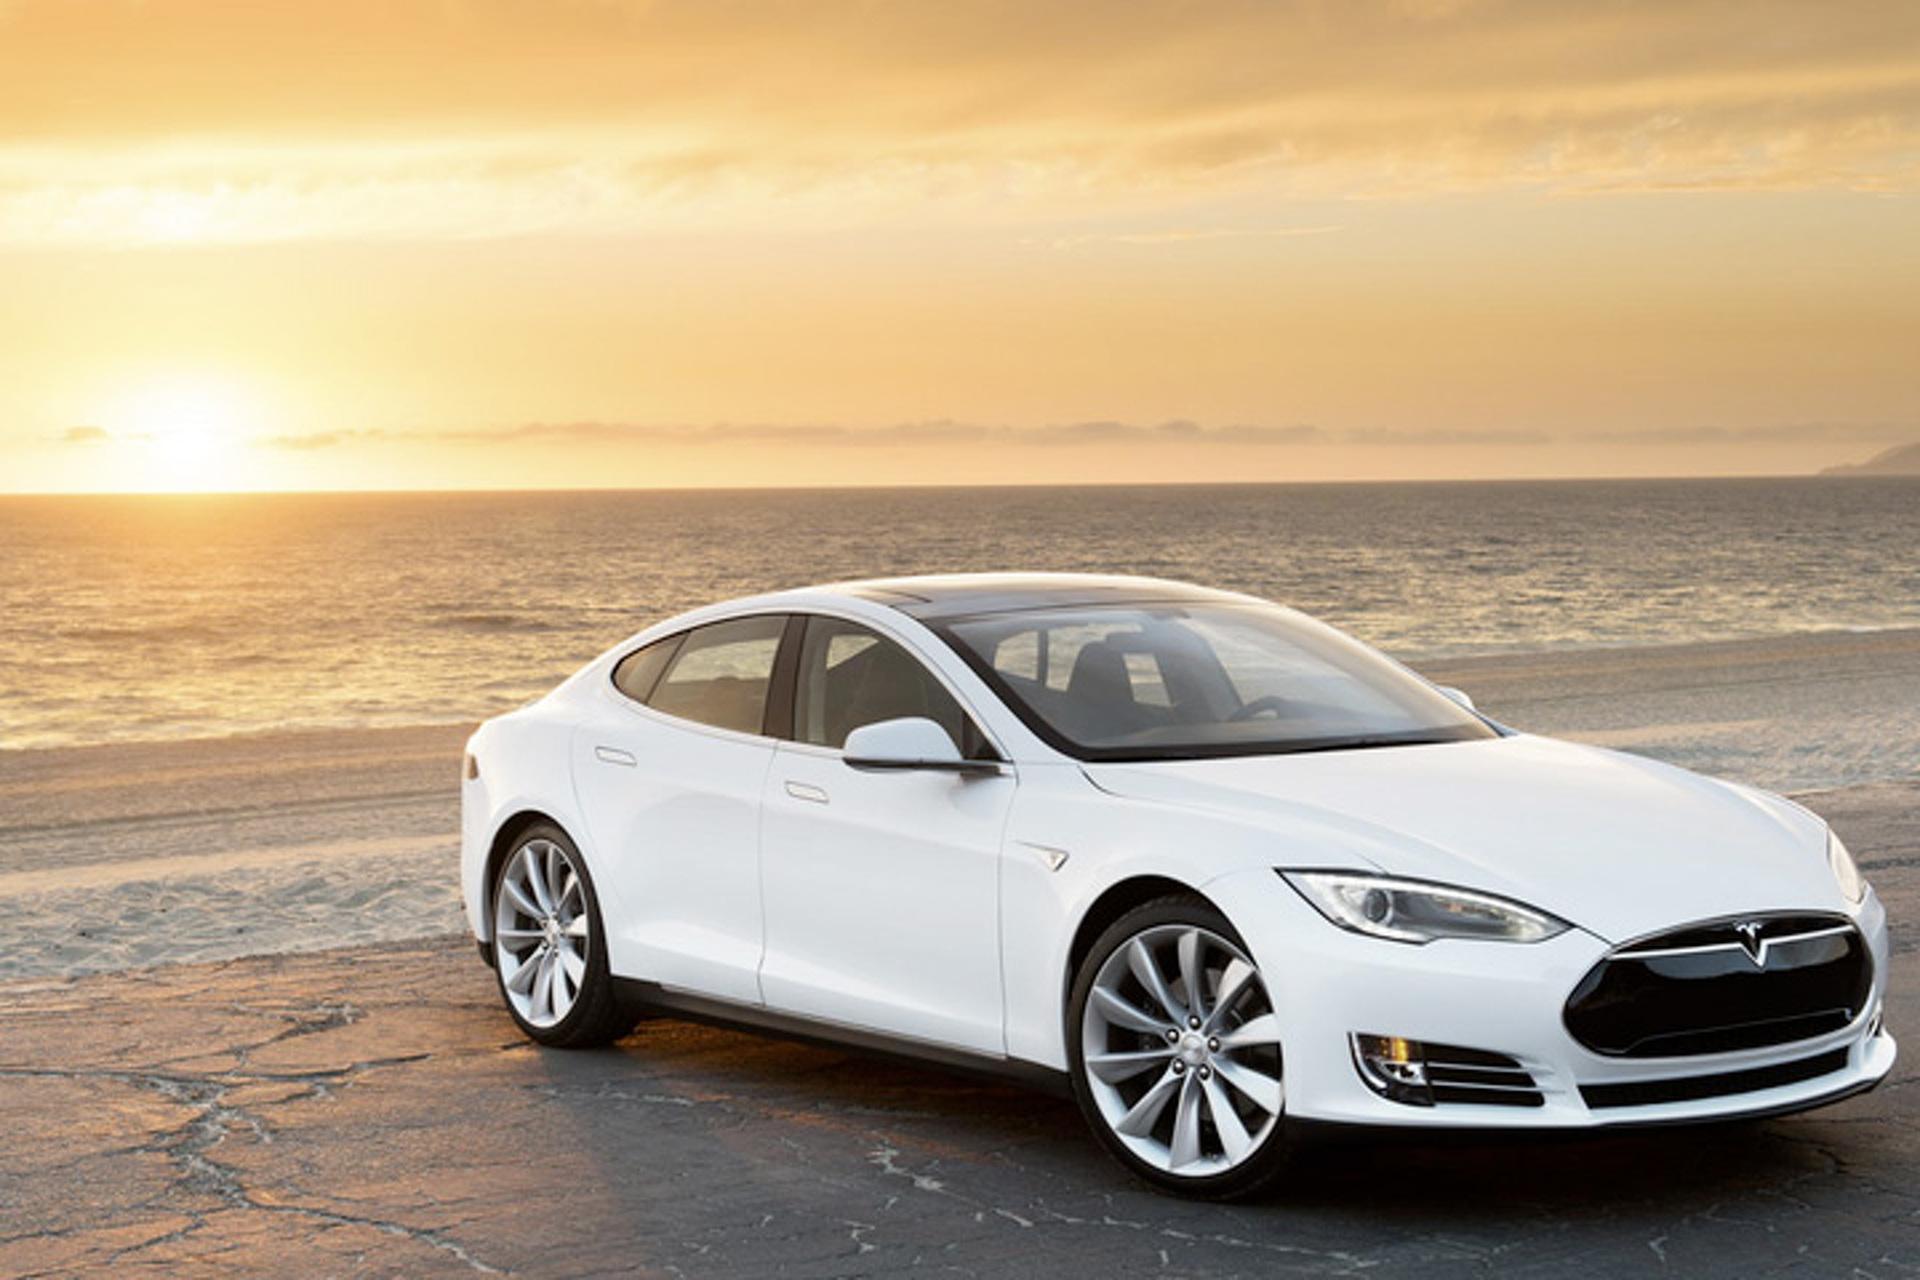 Georgia Latest State To Take Aim at Tesla Showrooms